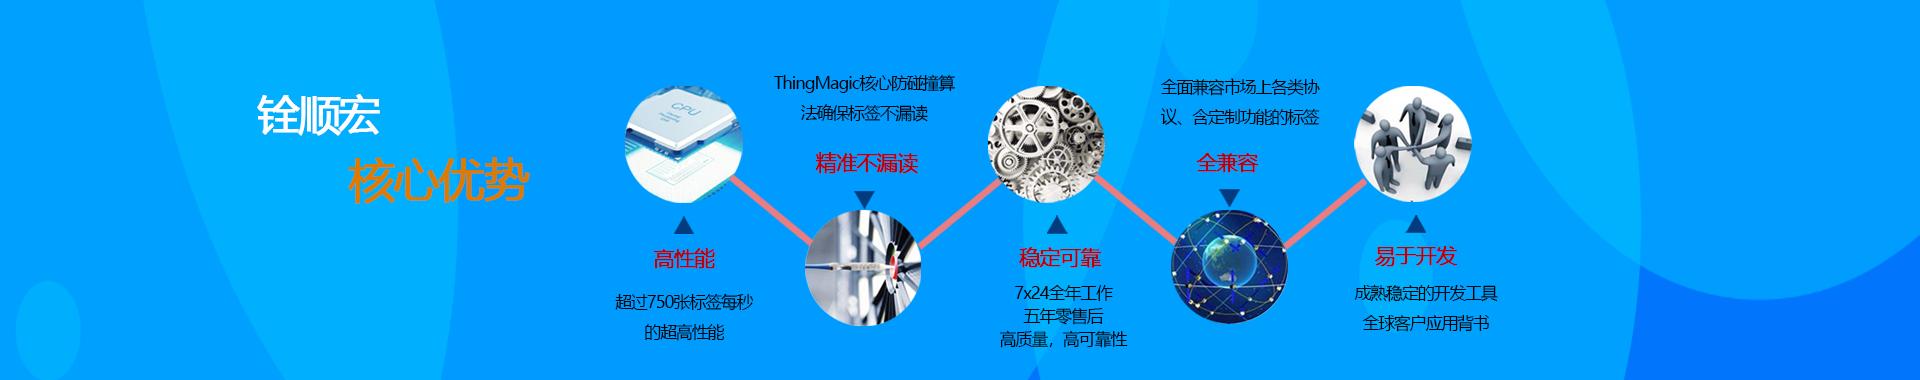 RFID射频技术|RFID性能,RFID标签,铨顺宏